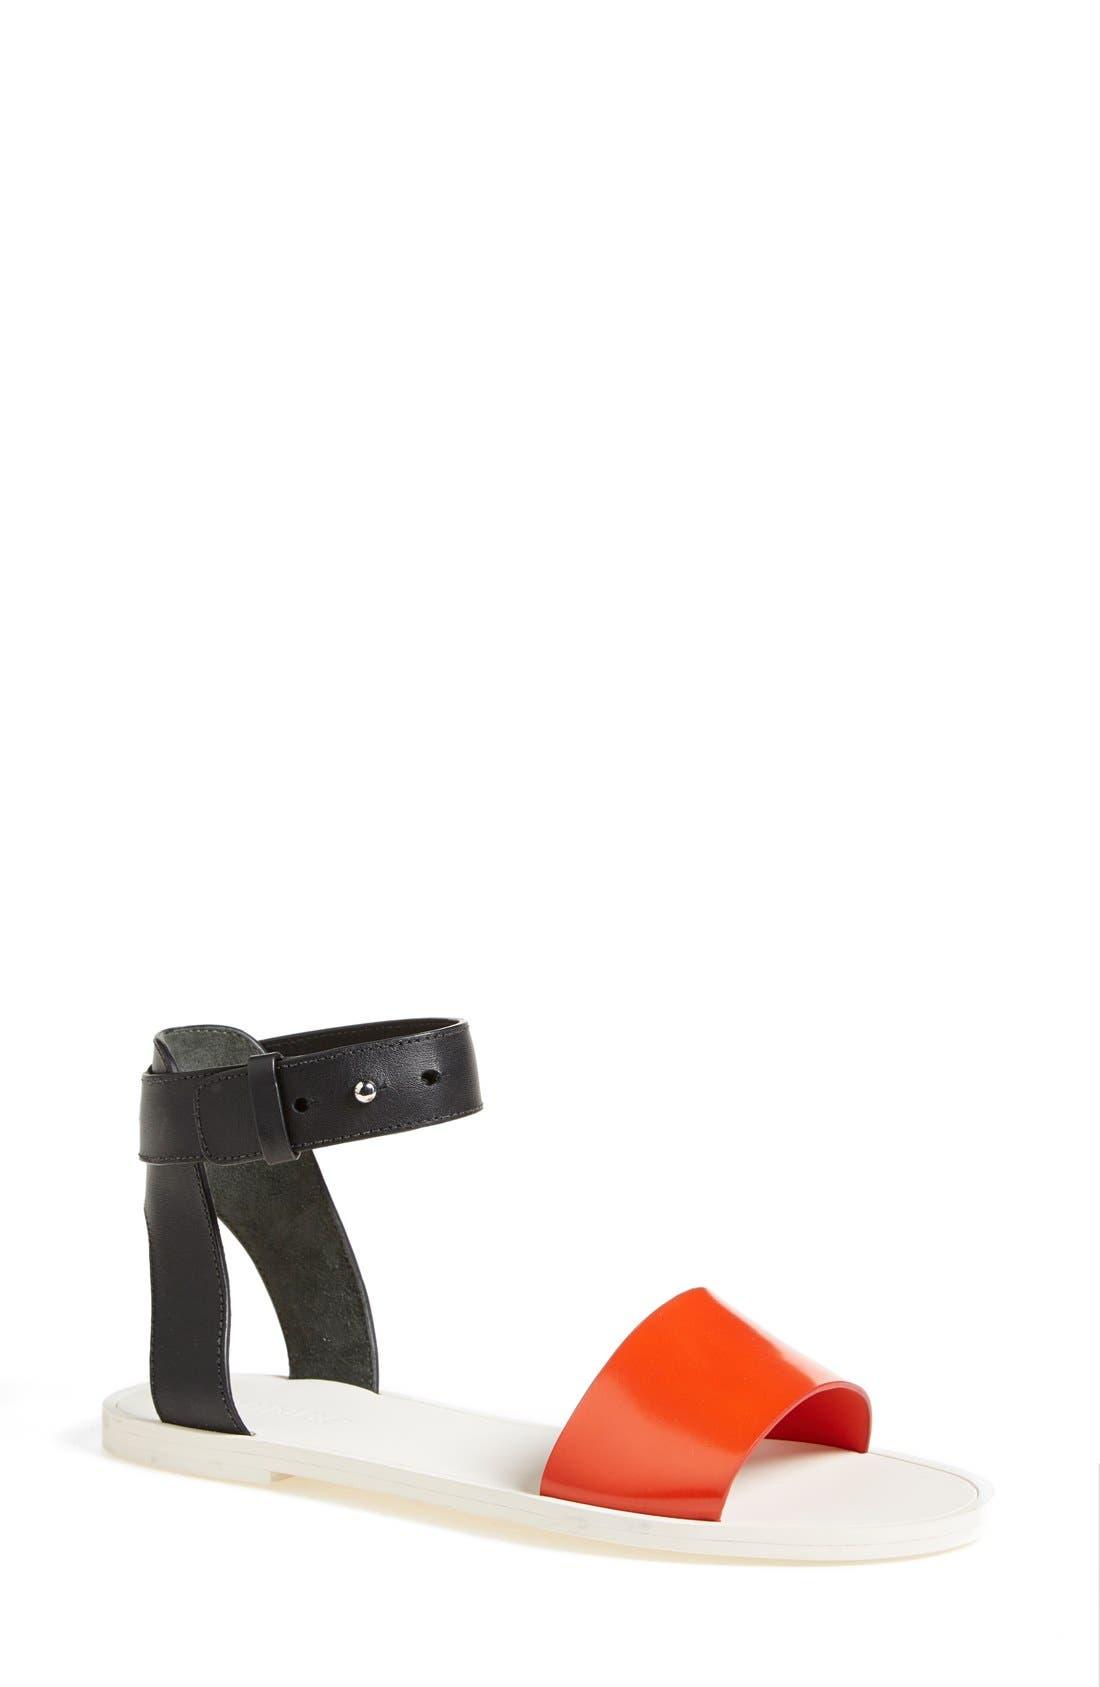 Alternate Image 1 Selected - Vince 'Sawyer' Colorblock Sandal (Women)